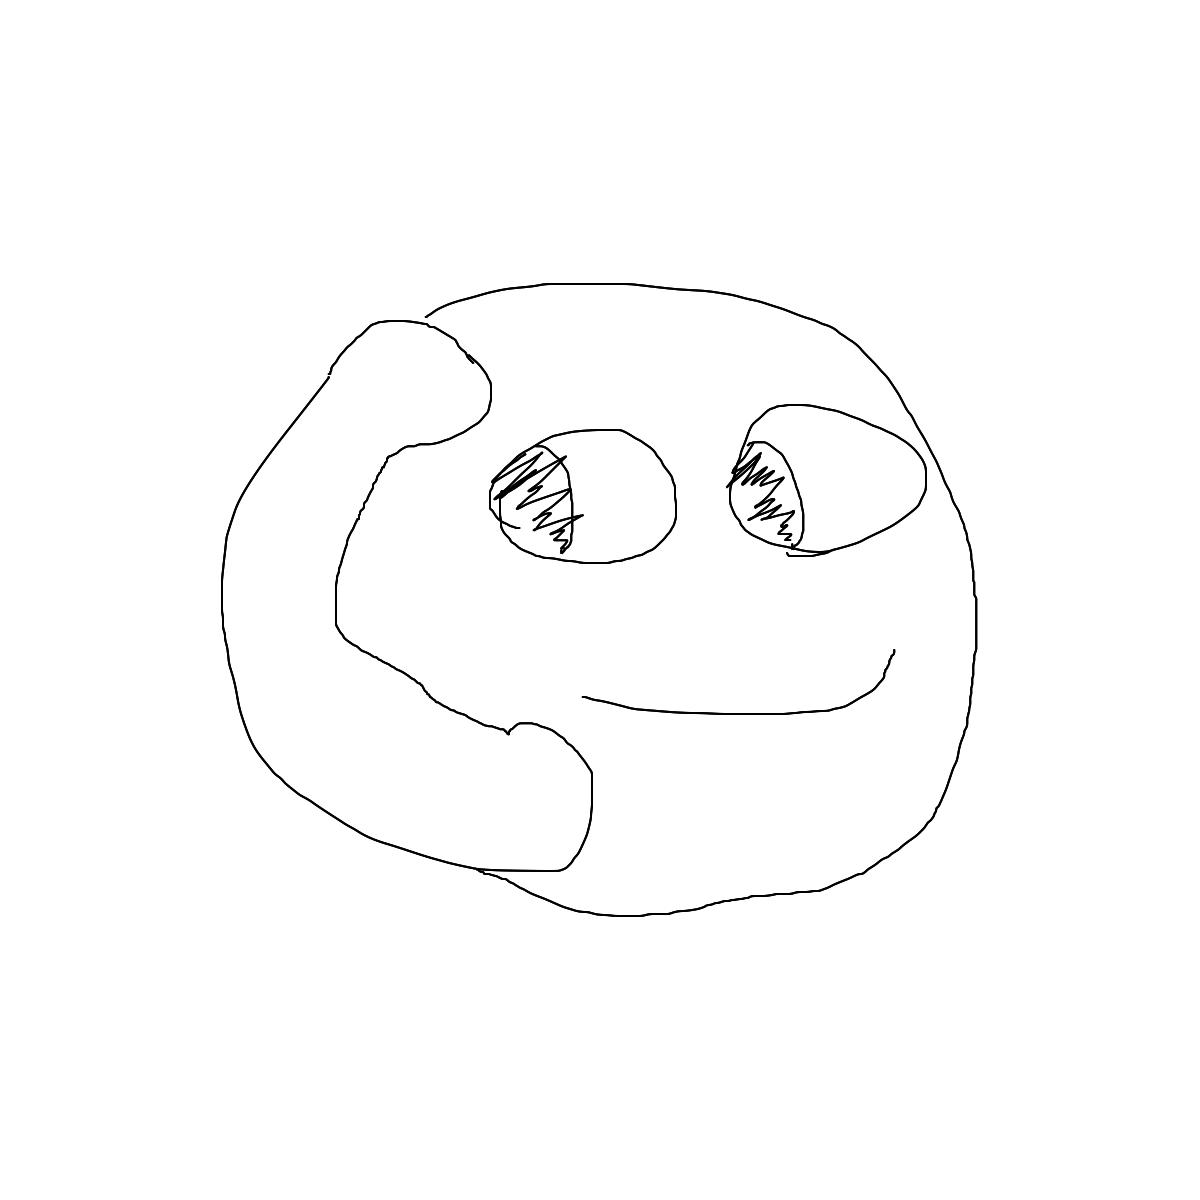 BAAAM drawing#7966 lat:35.6494712829589840lng: 139.6730041503906200